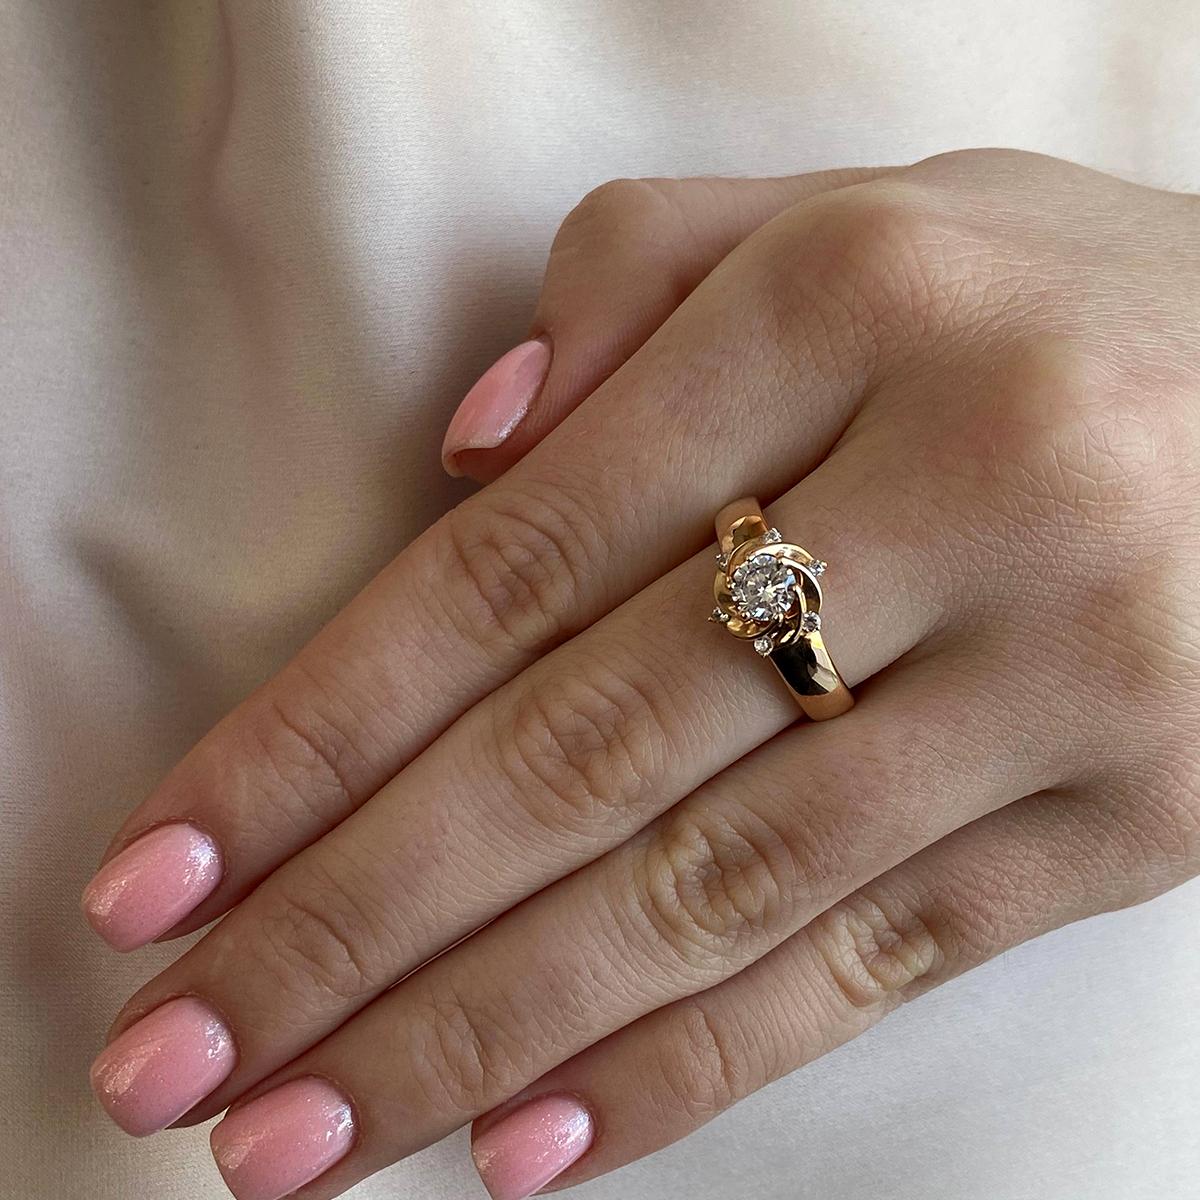 Кольцо из красного золота Вилена с фианитами 000103730 15.5 размера от Zlato - 3